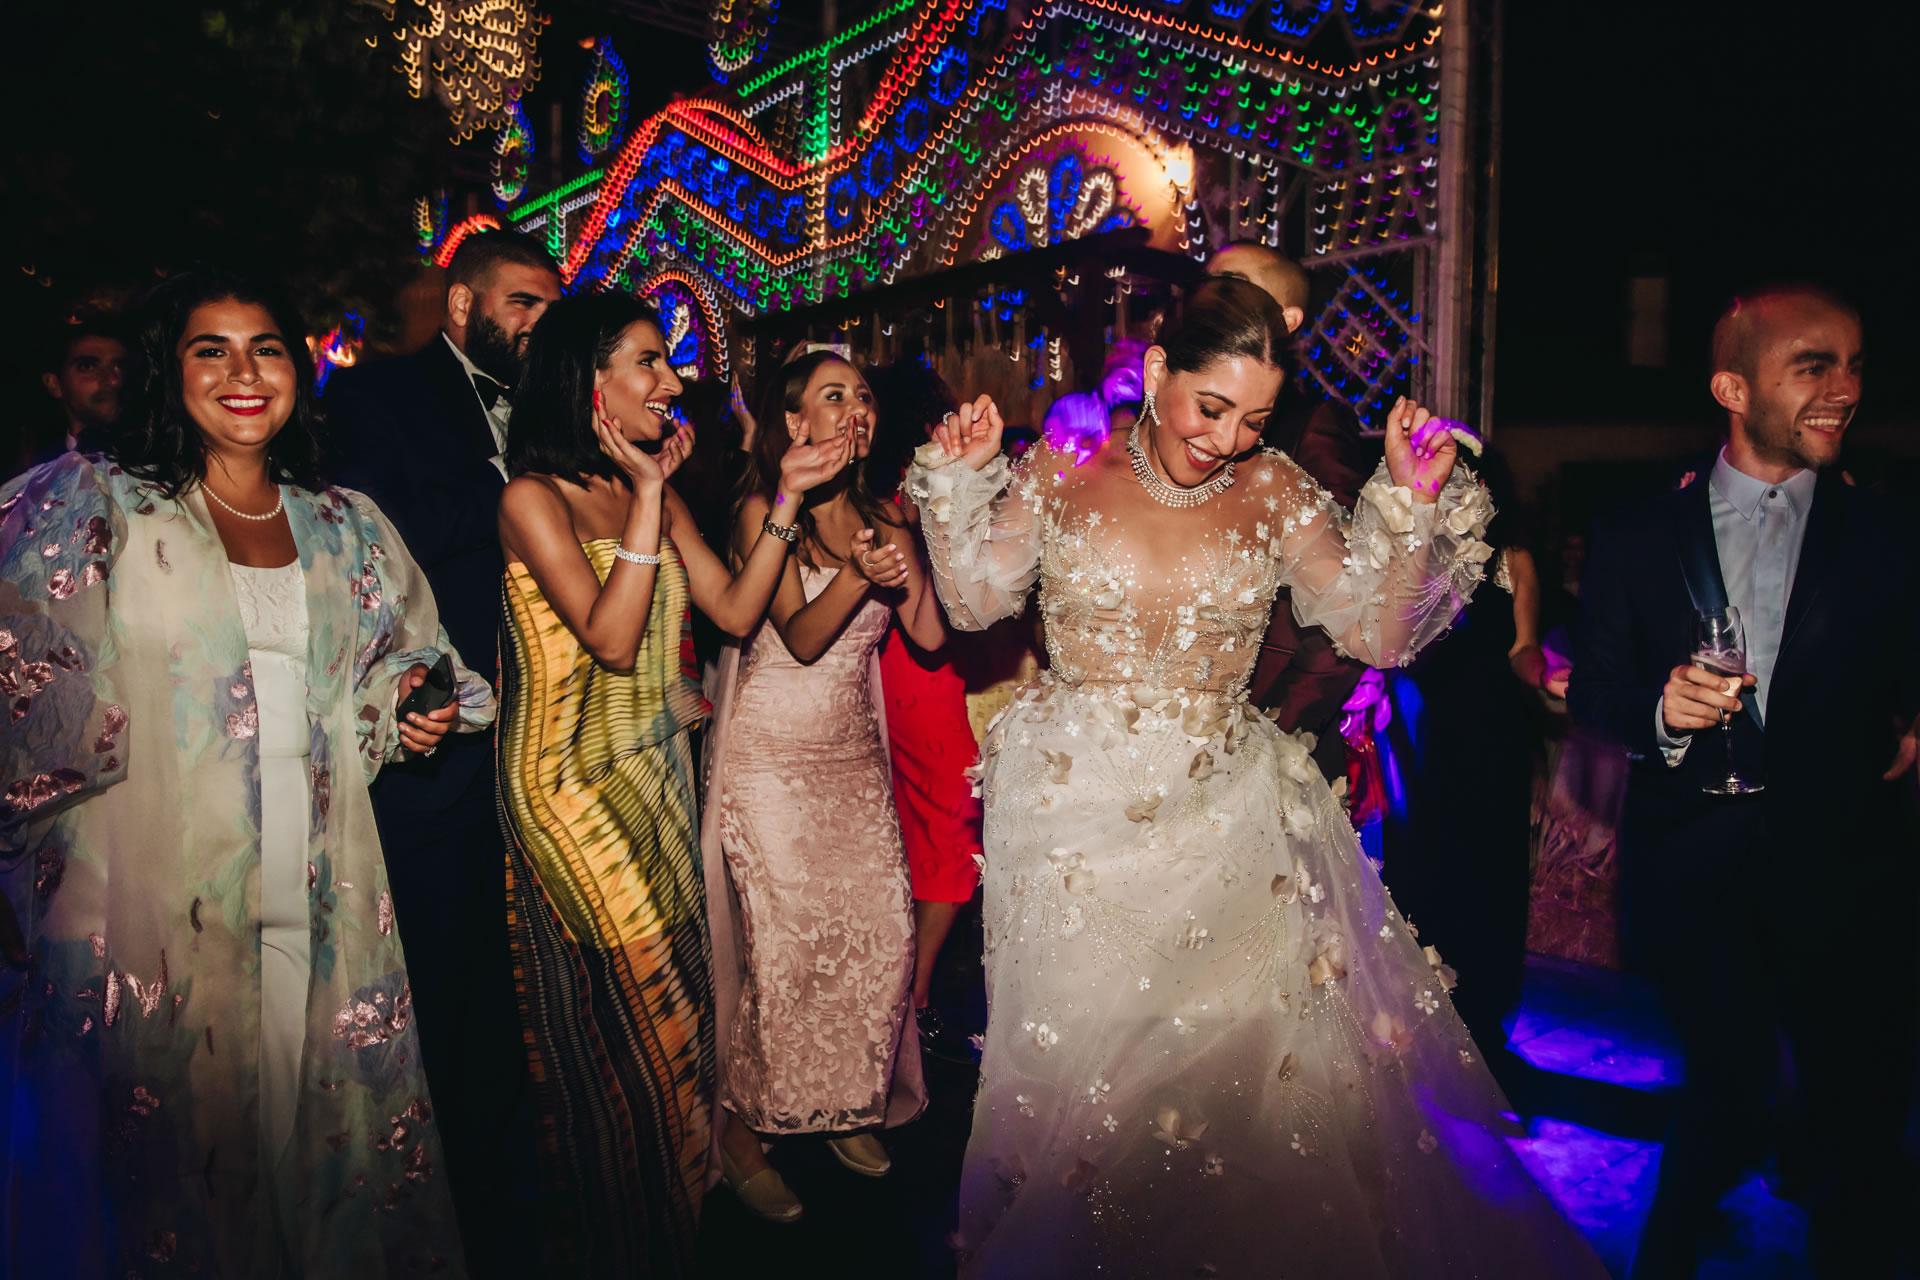 Dancing Friends - 81 :: Luxury wedding at Il Borro :: Luxury wedding photography - 80 :: Dancing Friends - 81